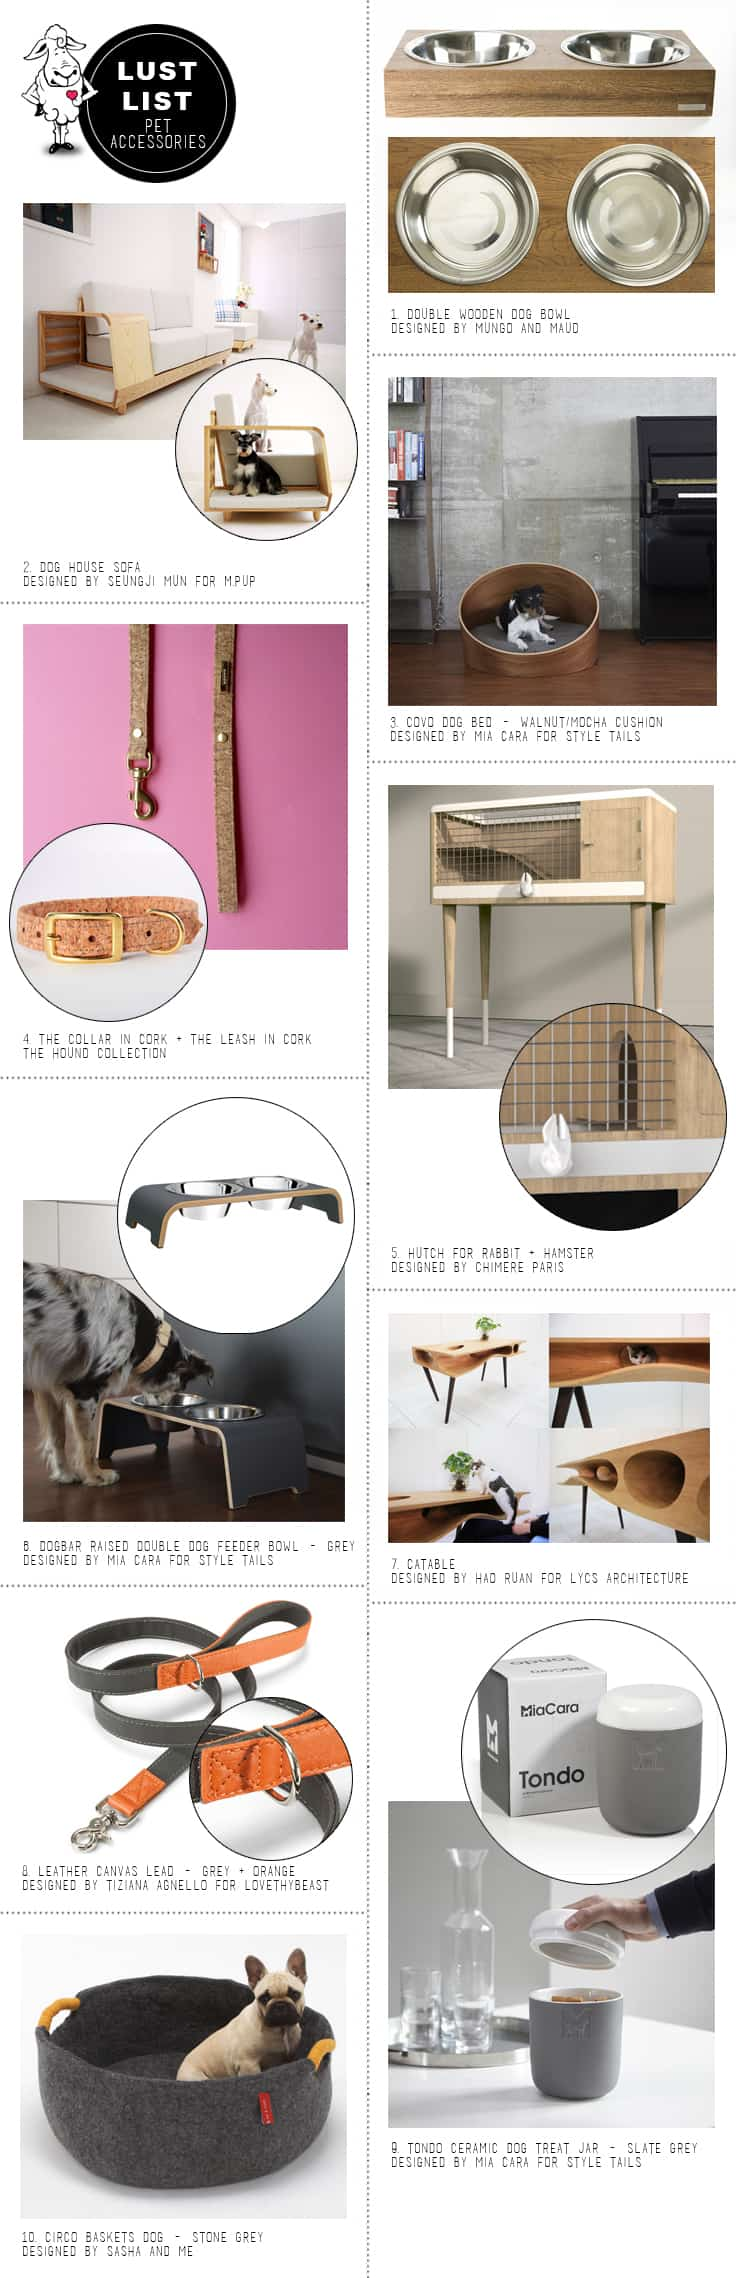 Designer Pet Accessories for the design conscious home owner